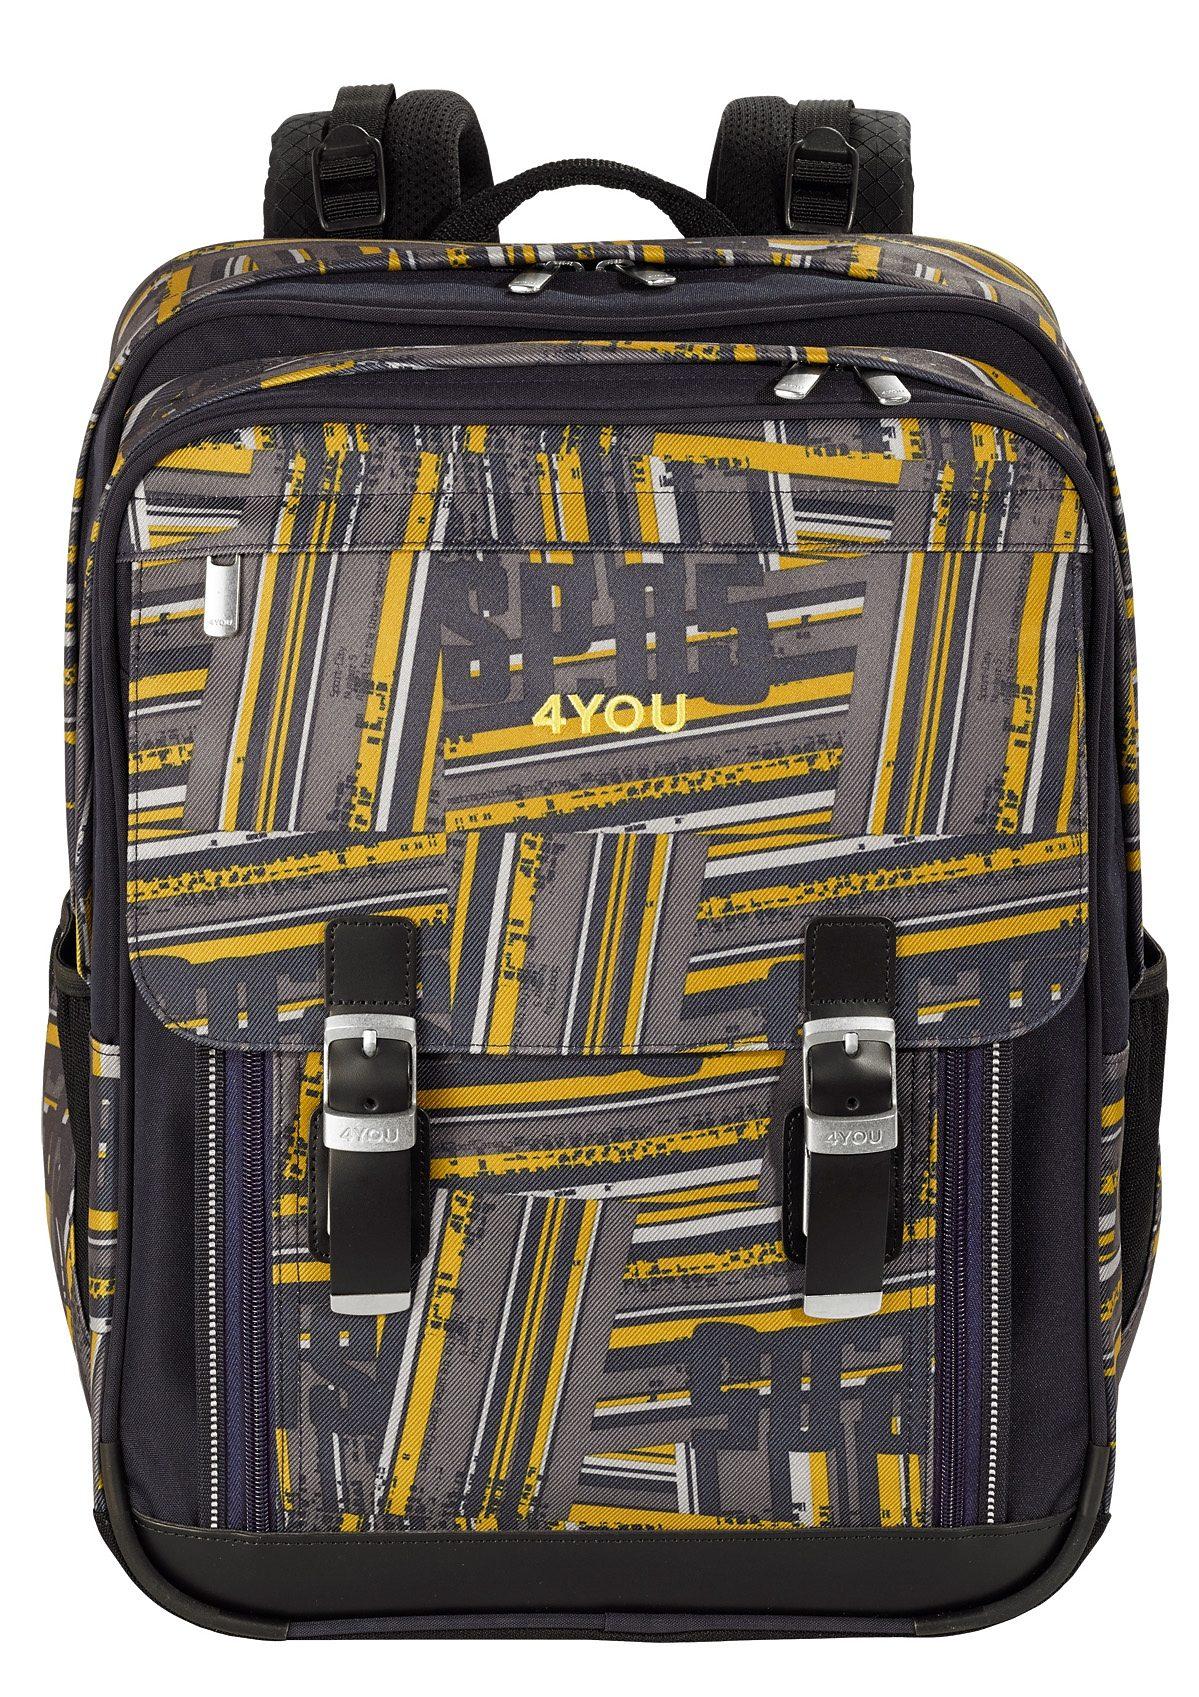 4YOU Schulrucksack mit Laptopfach, Stripes, »Classic Plus«